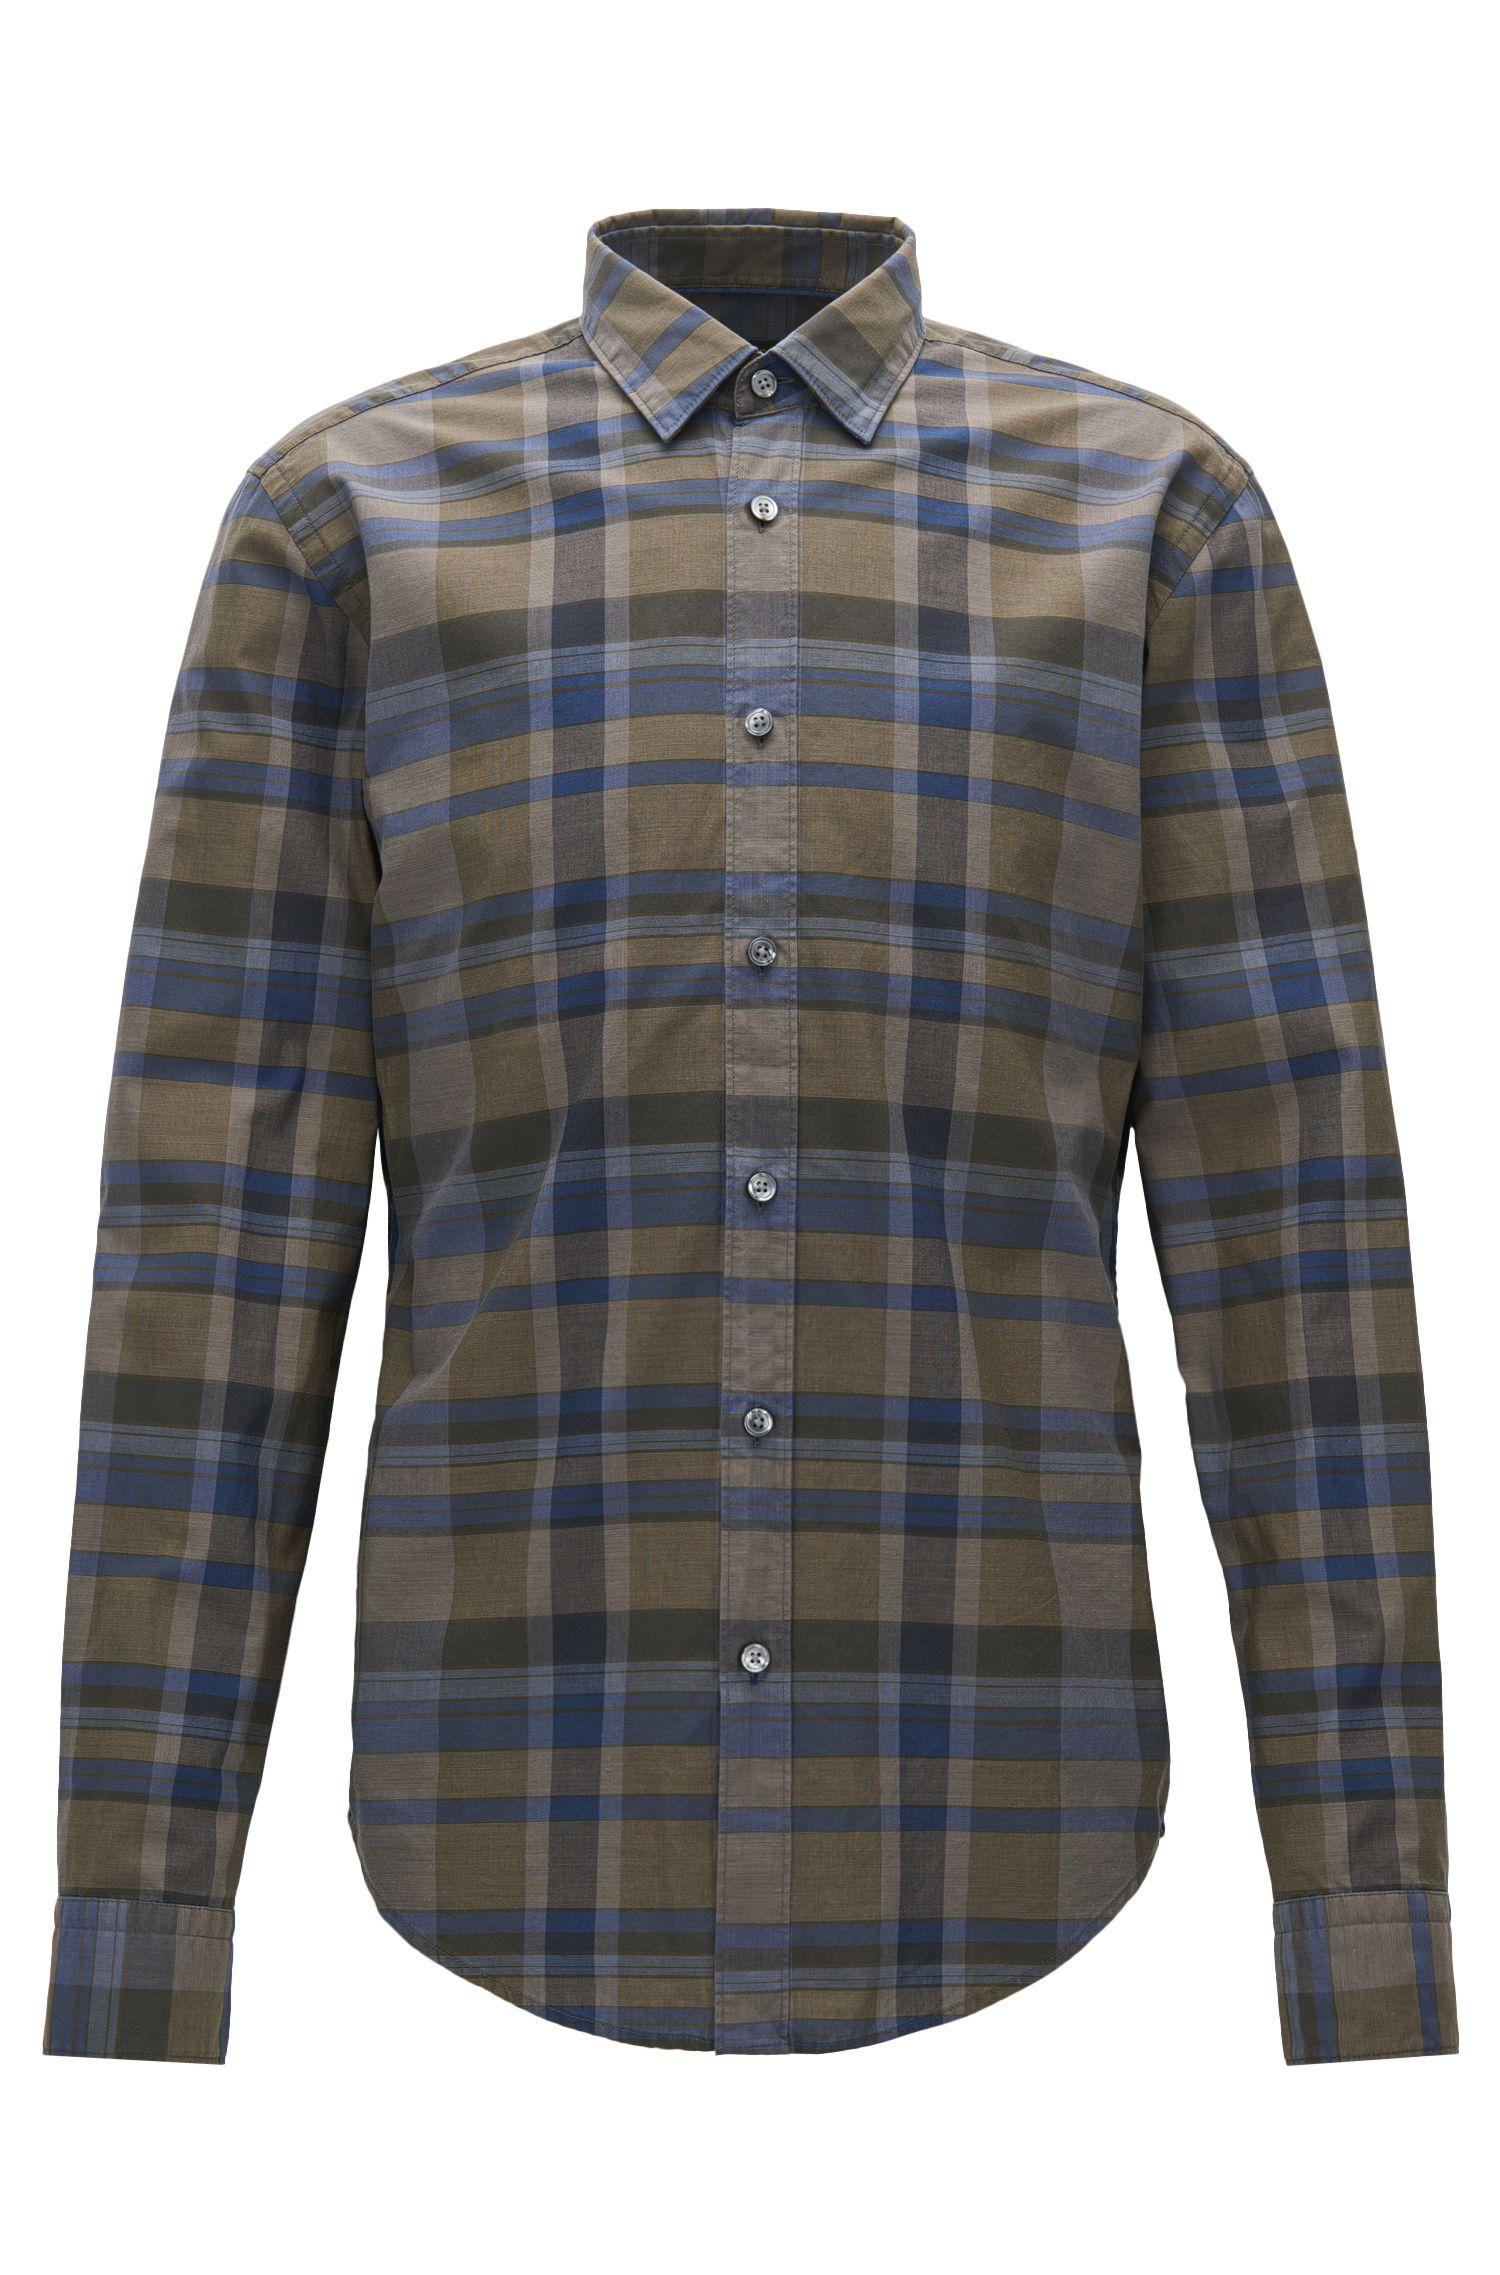 Plaid Cotton Button Down Shirt, Slim Fit | Ronni